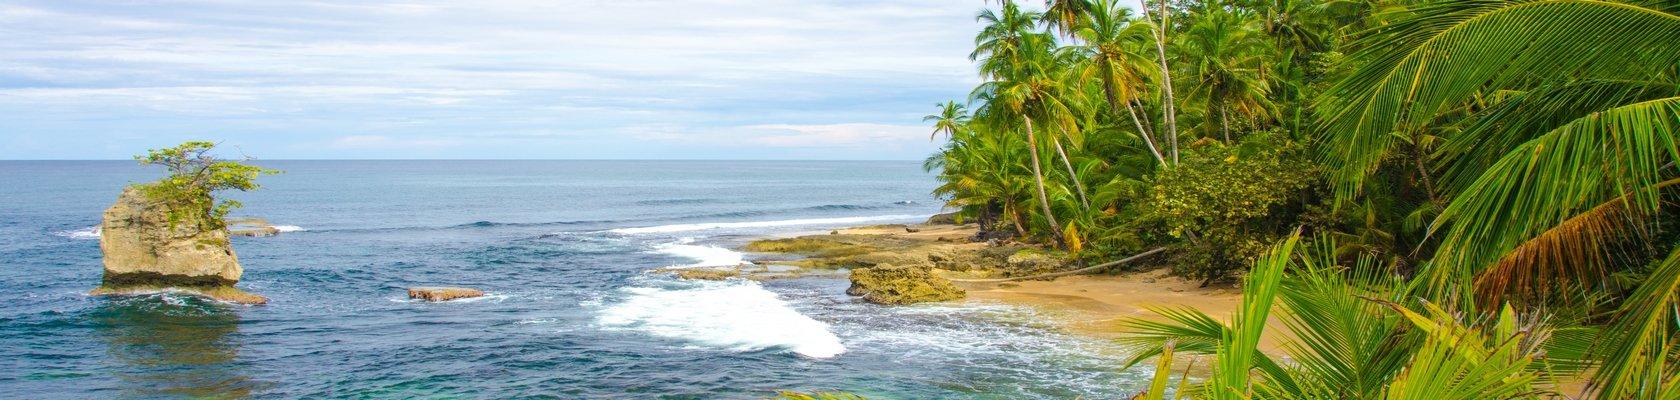 Caraïbische kust